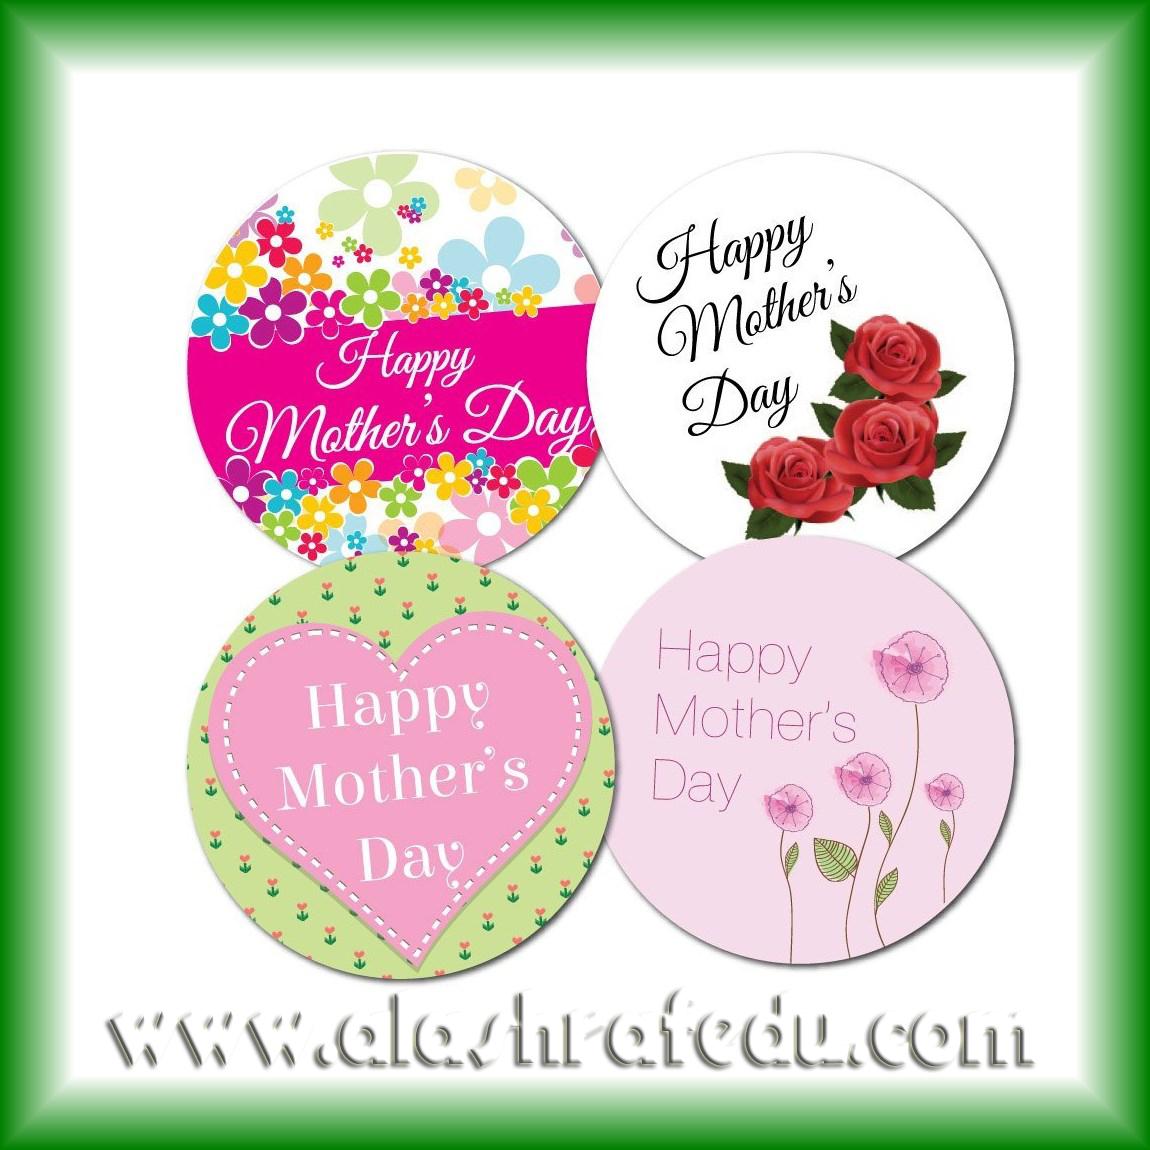 Happy Mother' Group 2018 www.alashrafedu.com1